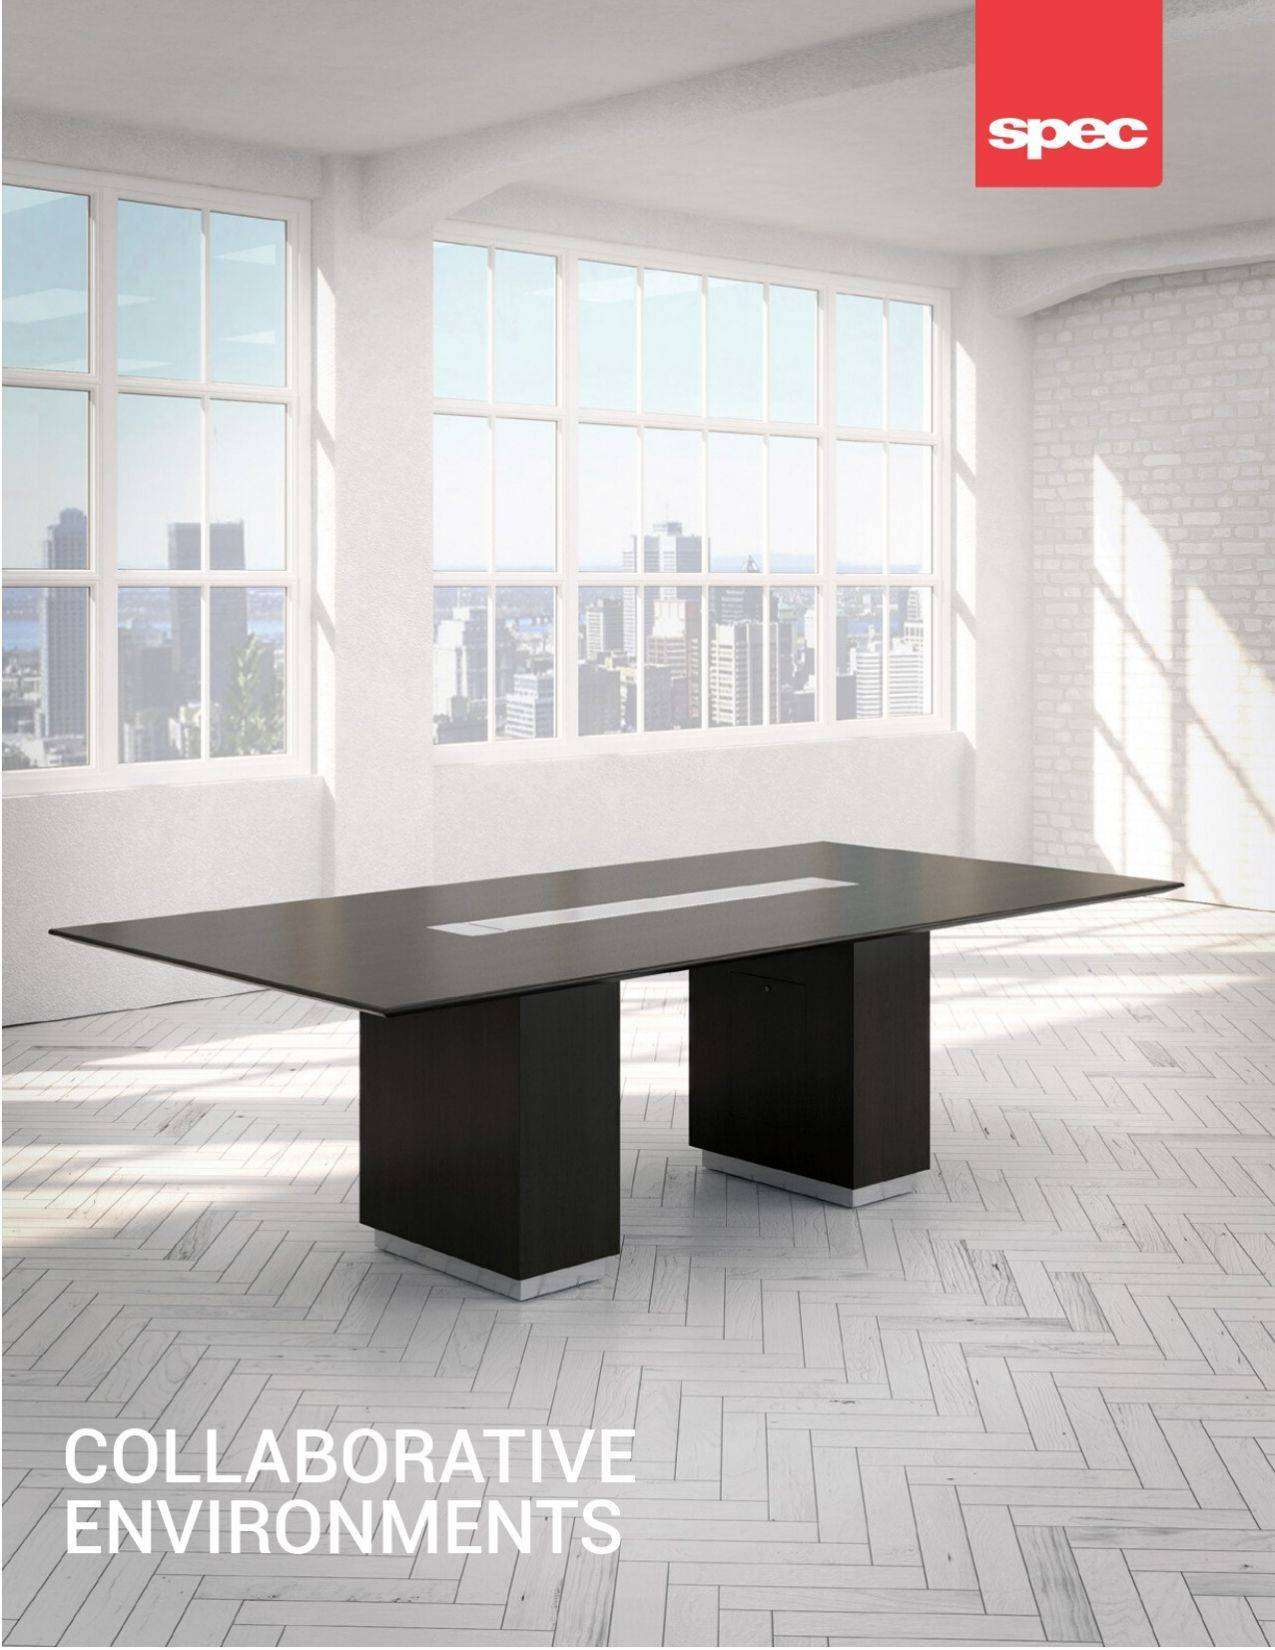 Spec Furniture Collaborative Environments Brochure